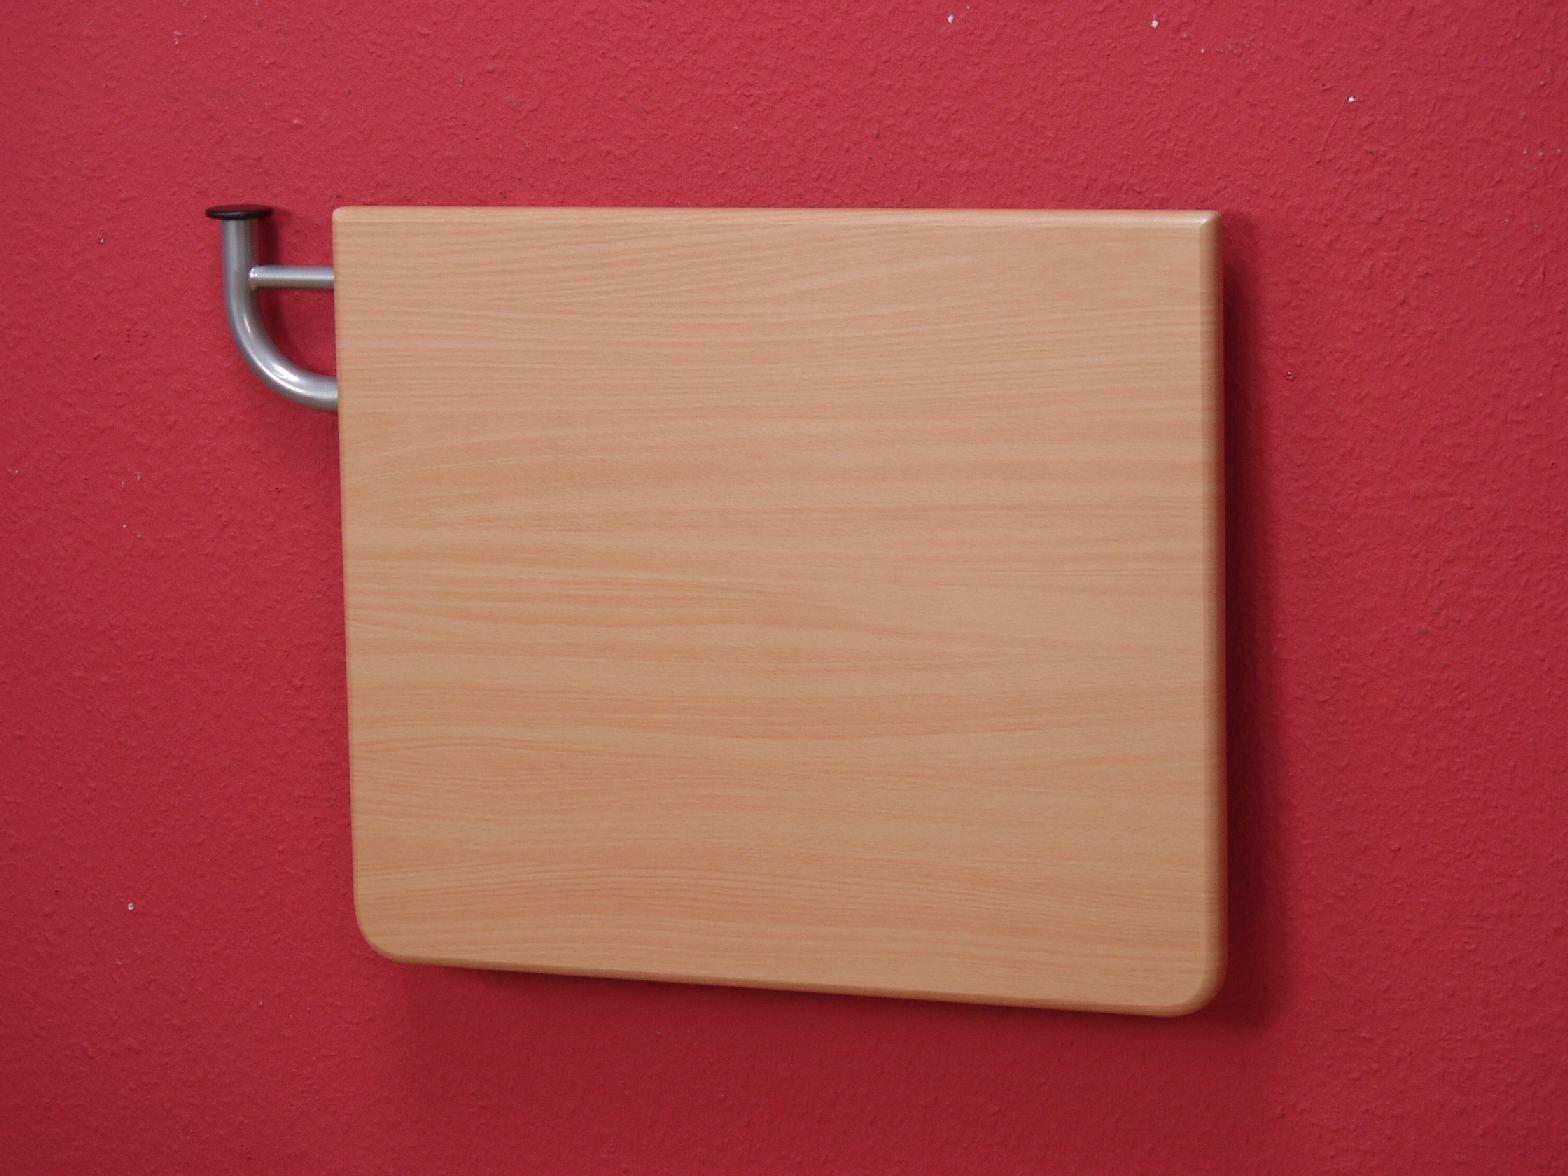 Wandtisch klappbar  Wandtisch abklappbar Buche Telefontisch Tisch Platte Wand ...